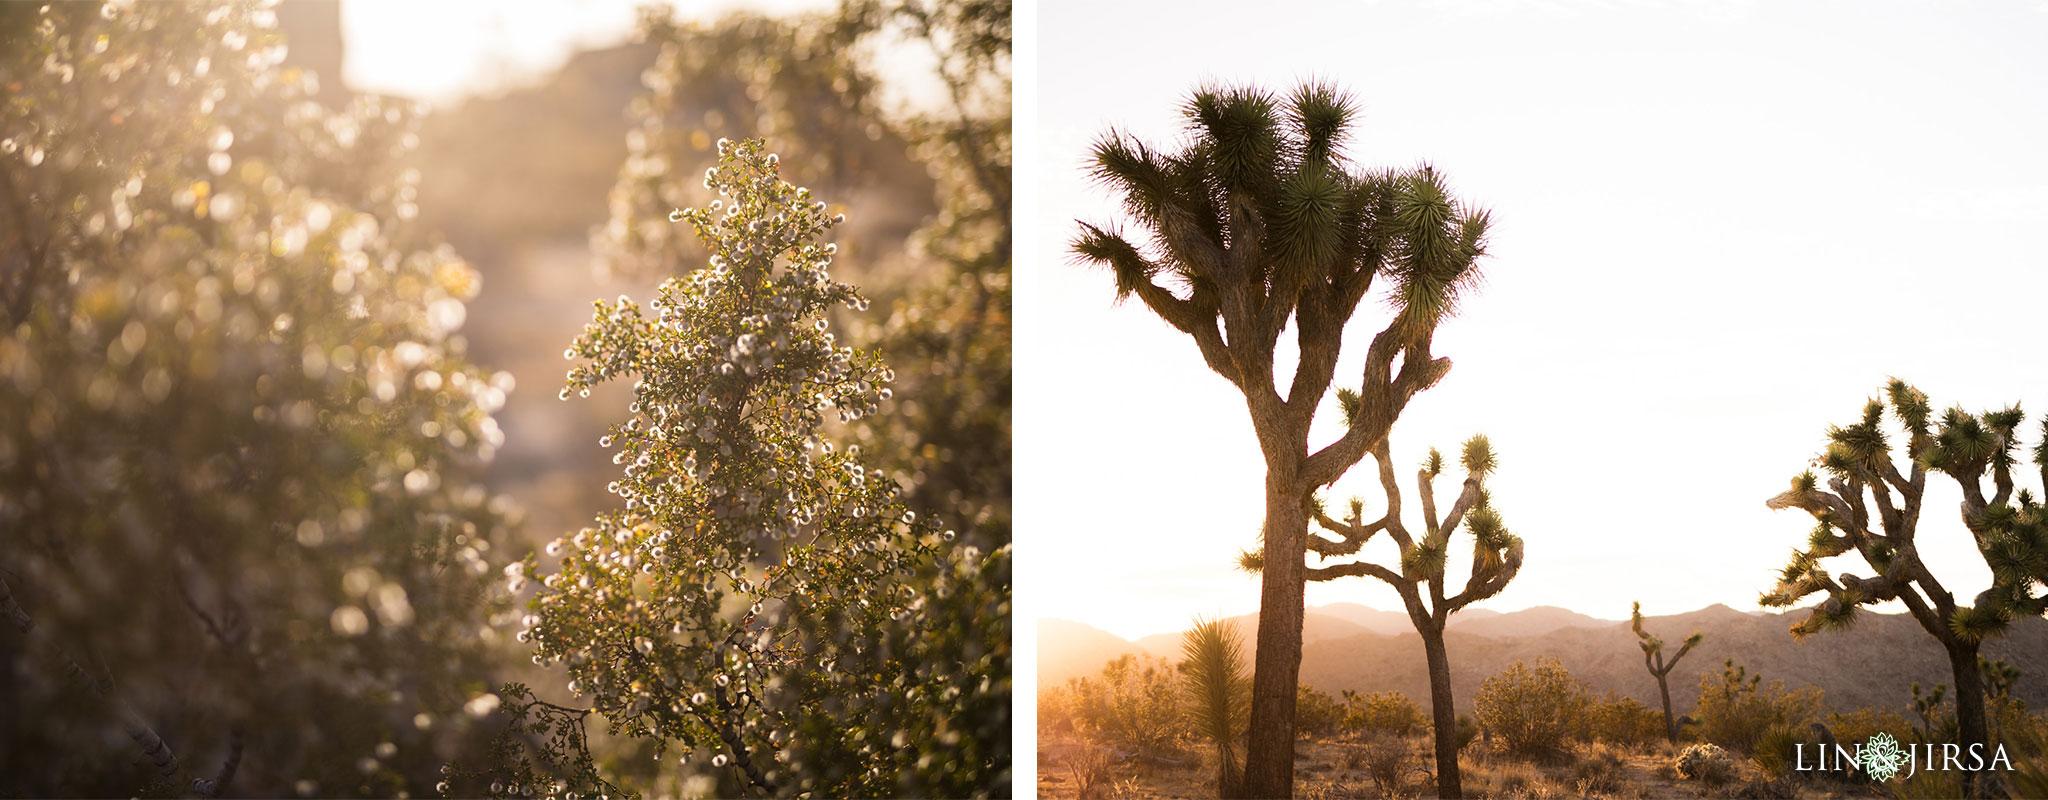 04 joshua tree national park desi engagement photography